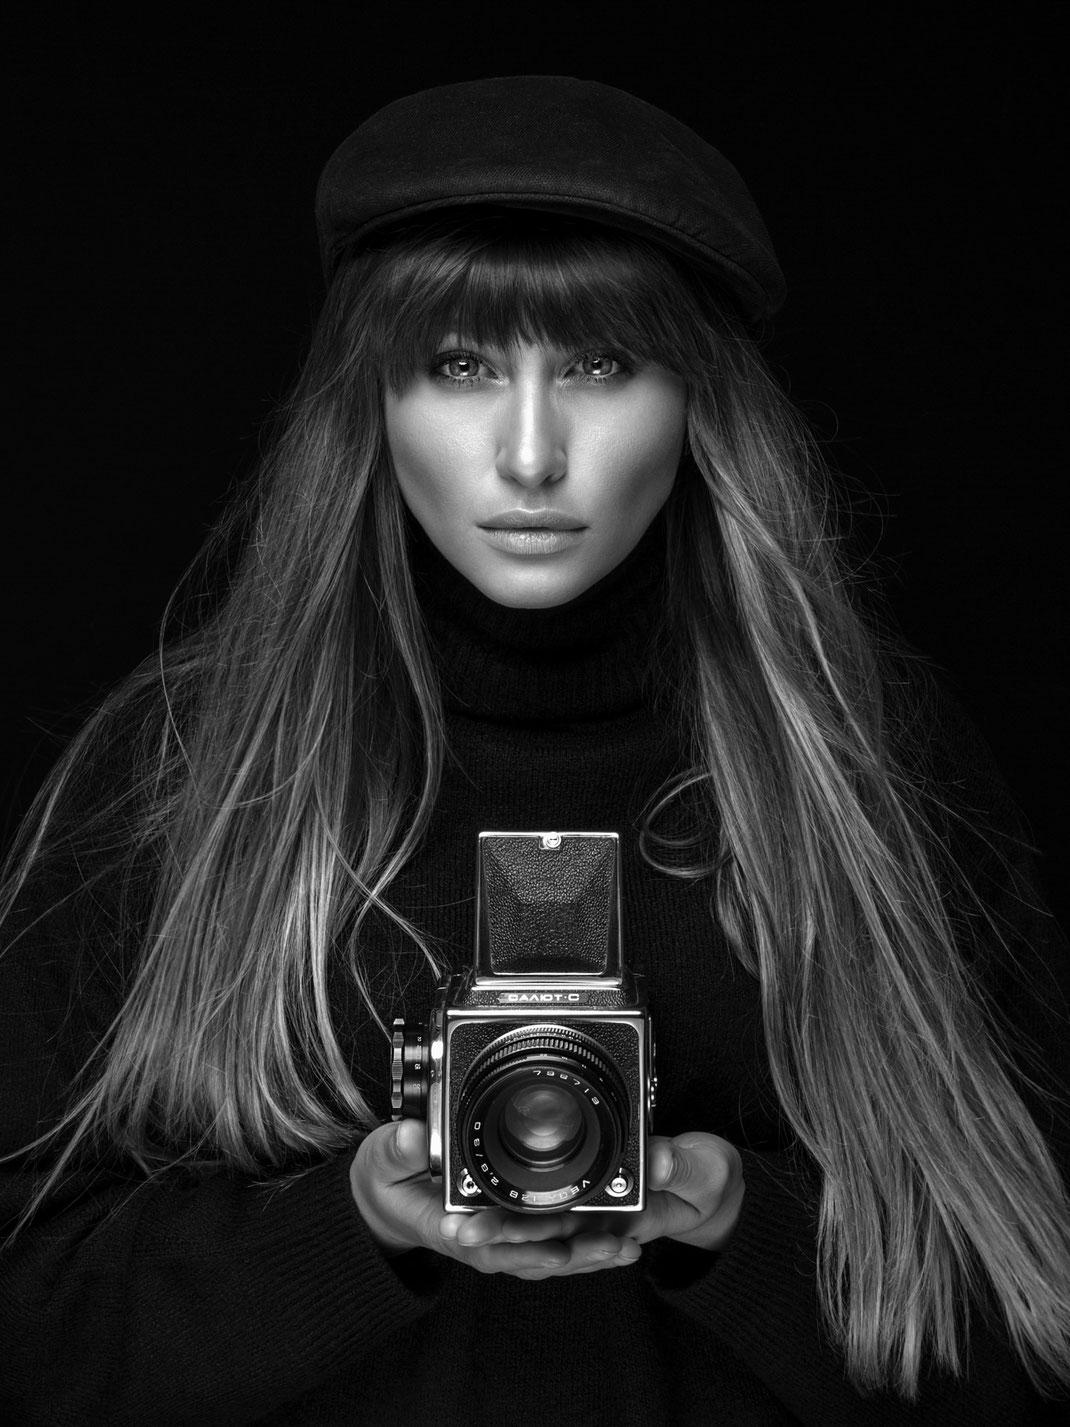 Two Beauties - Kristina & Salyut-S